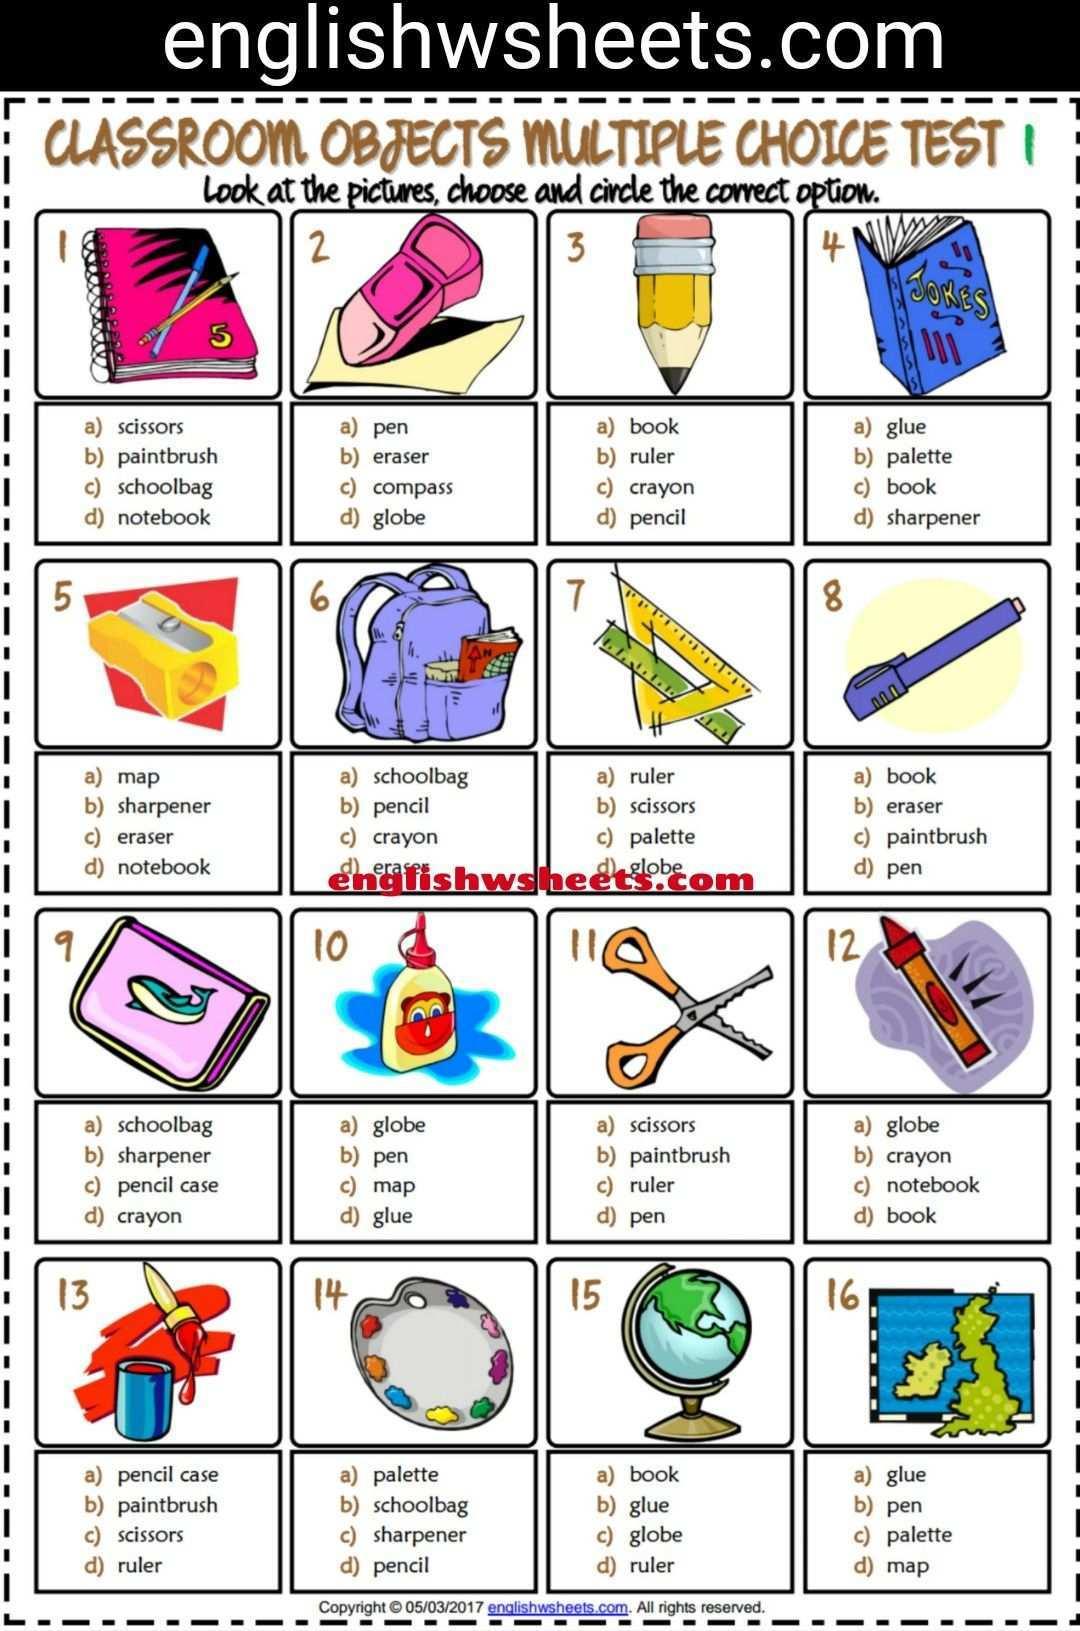 Classroom Objects Esl Printable Multiple Choice Tests For Kids Classroom Objects Esl Printab Learning English For Kids Classroom Language English Classroom